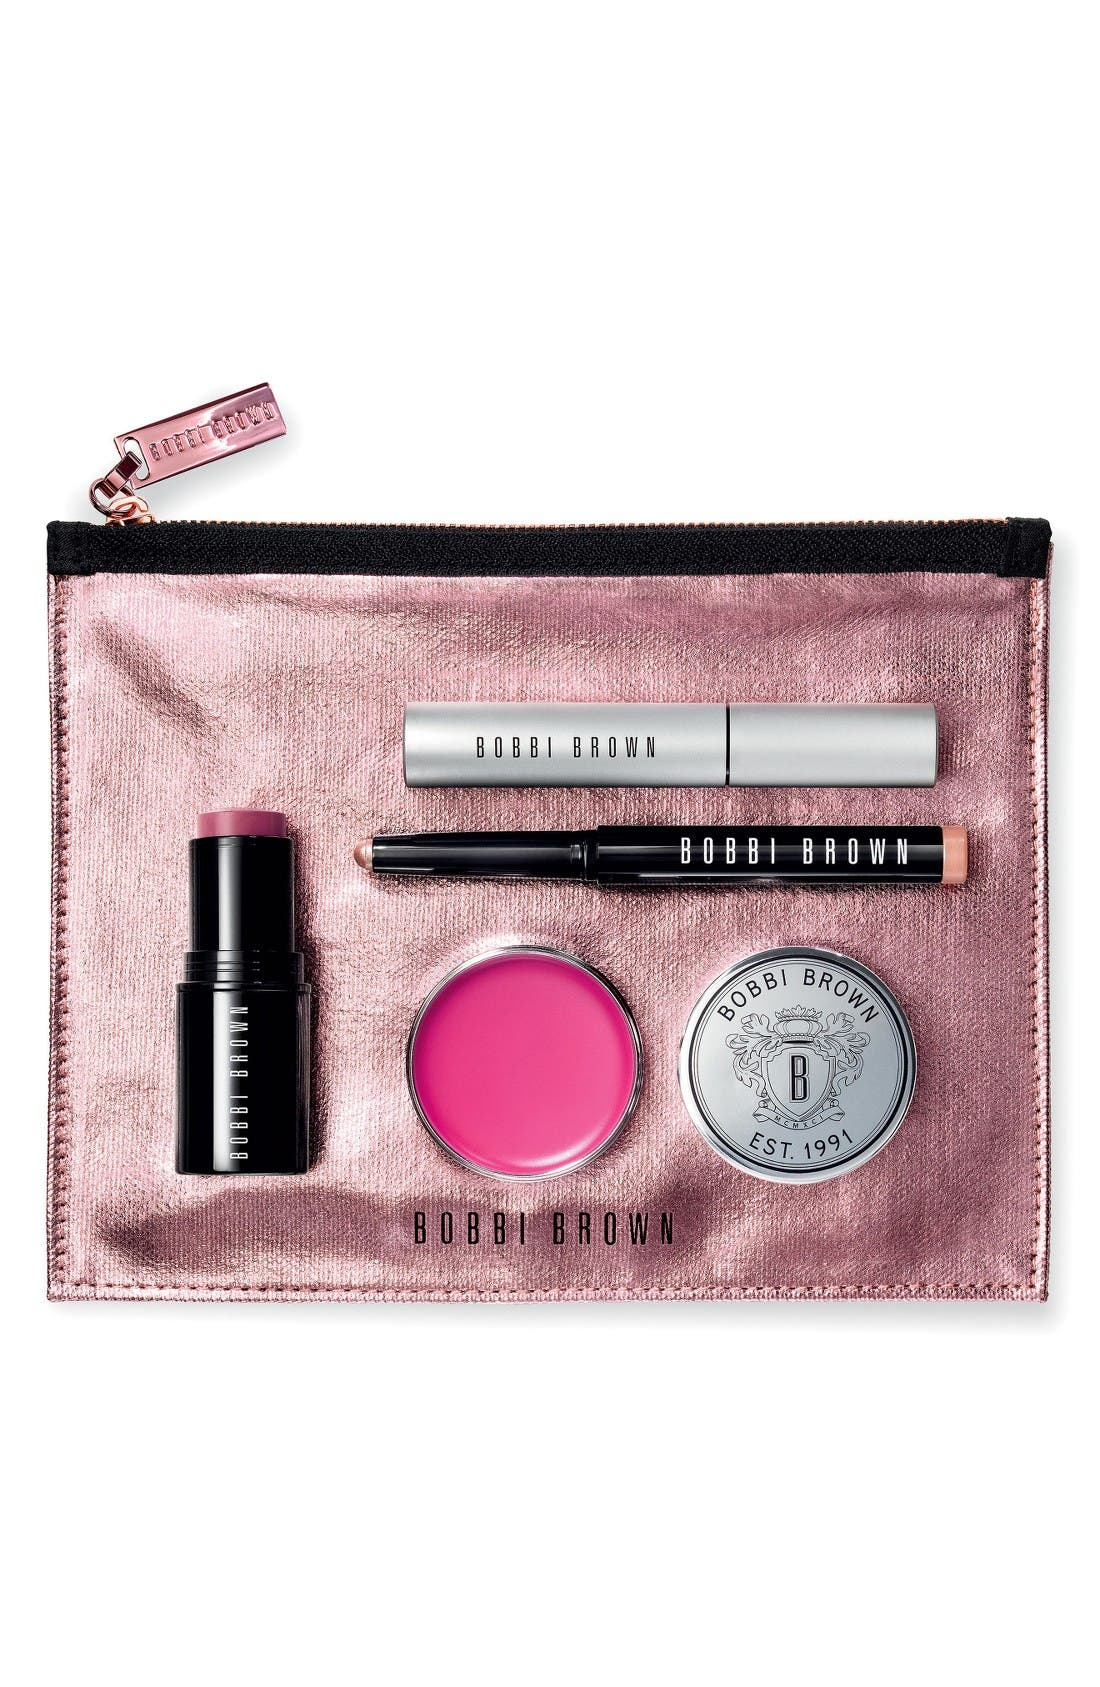 Bobbi Brown Style File Off Duty Eye, Cheek & Lip Kit (Nordstrom Exclusive) ($140 value)